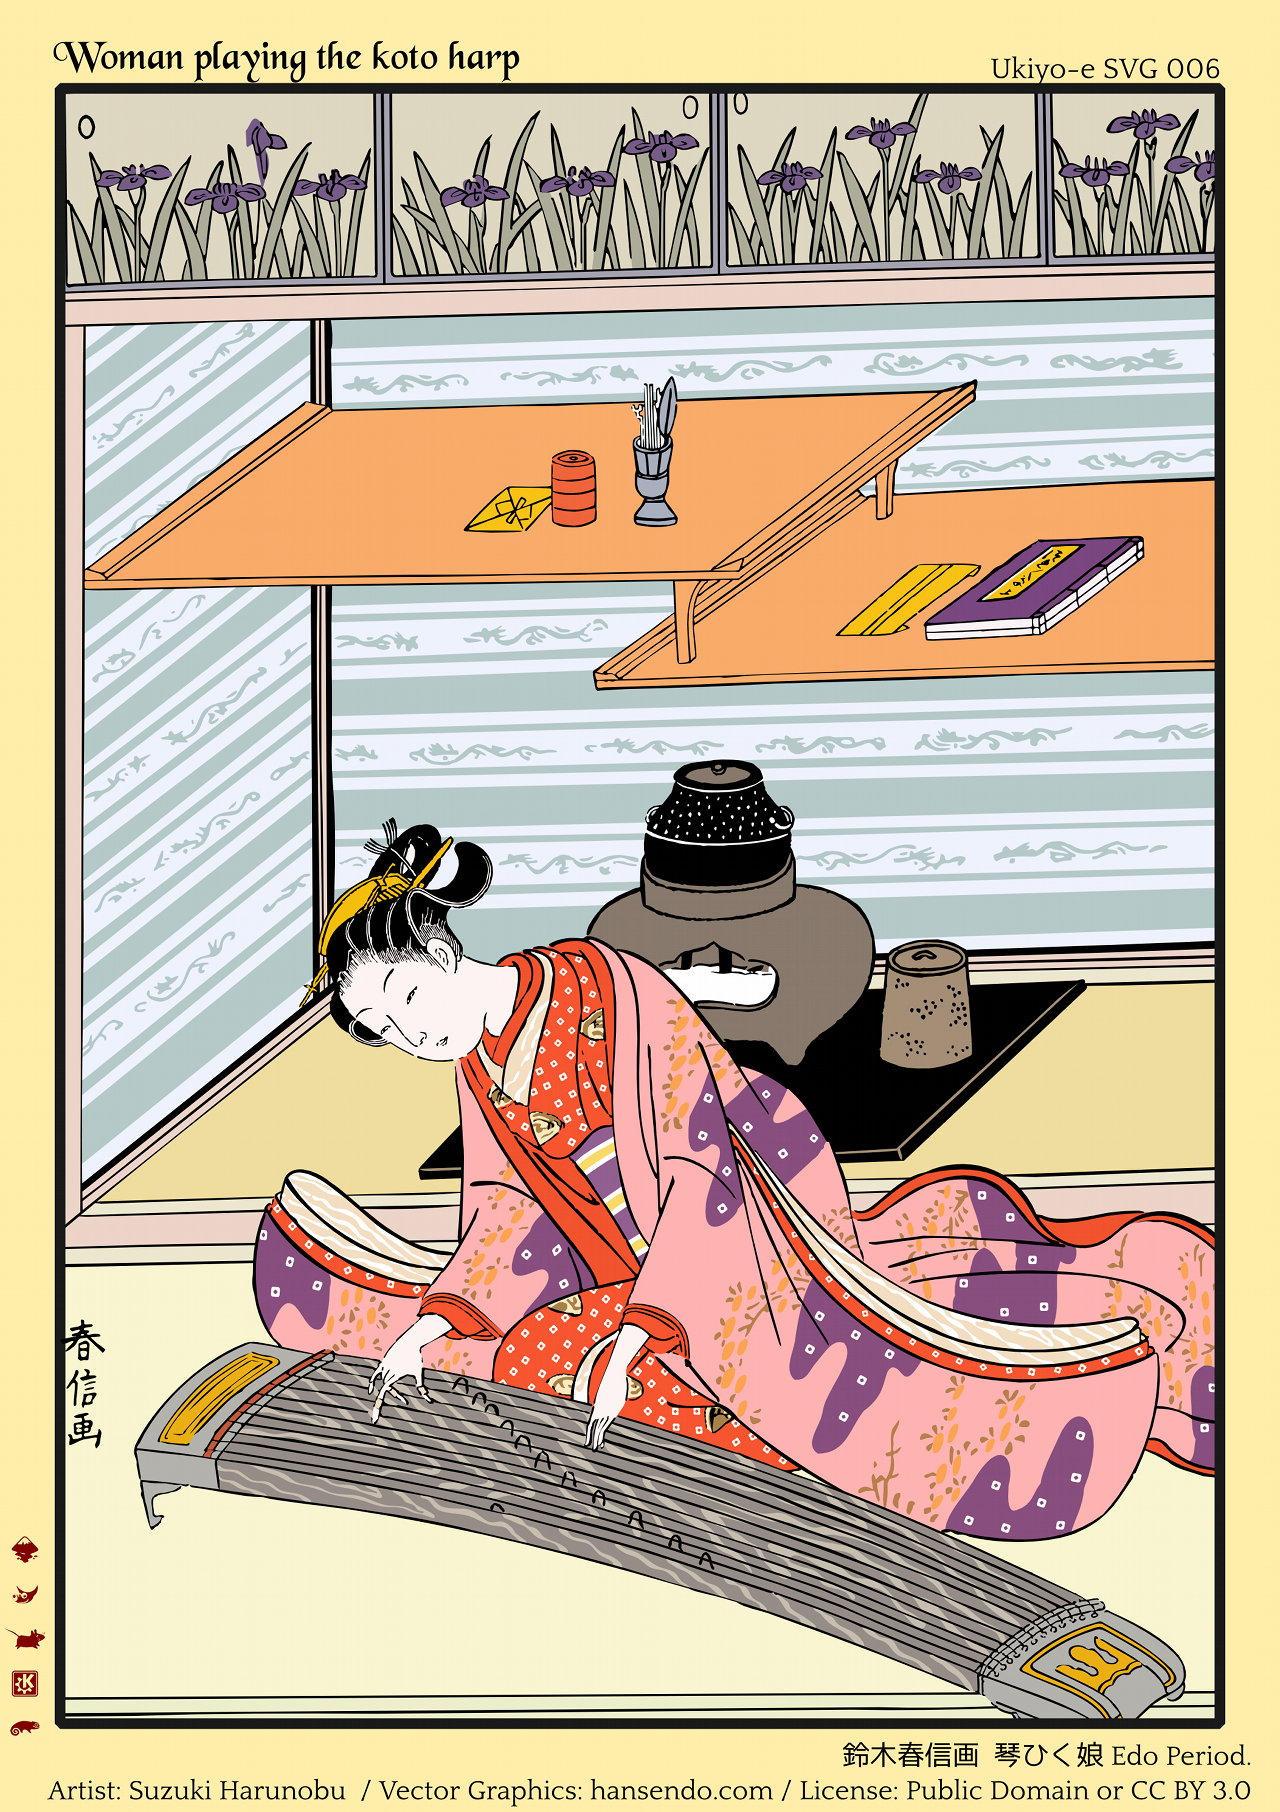 vector resources Ukiyo-e SVG No.006 by hansendo